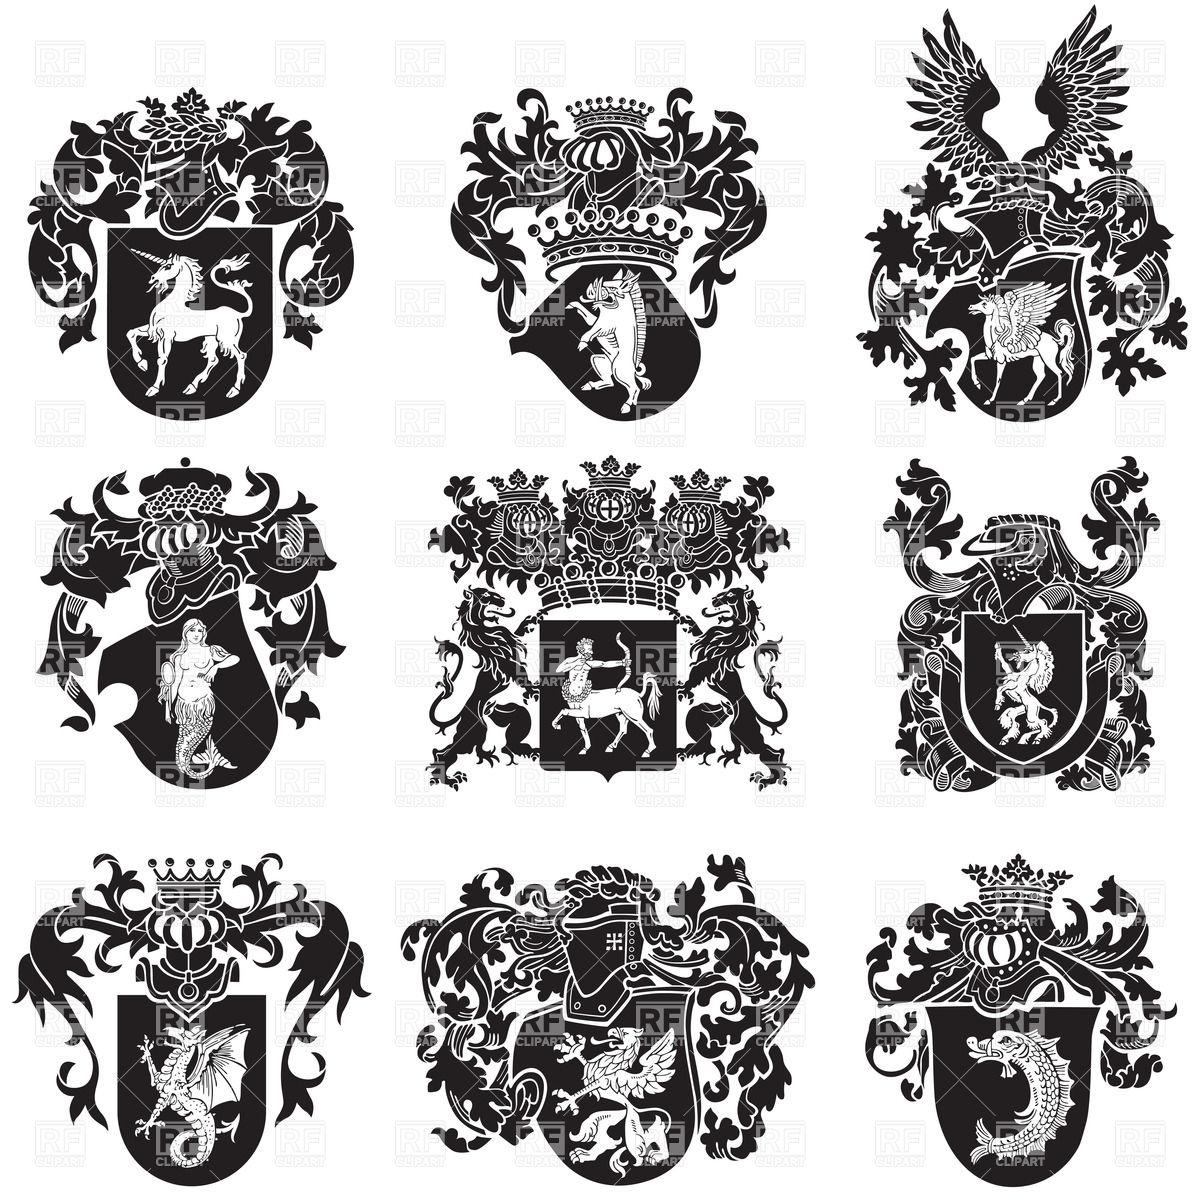 Black medieval heraldic emblems Stock Vector Image.